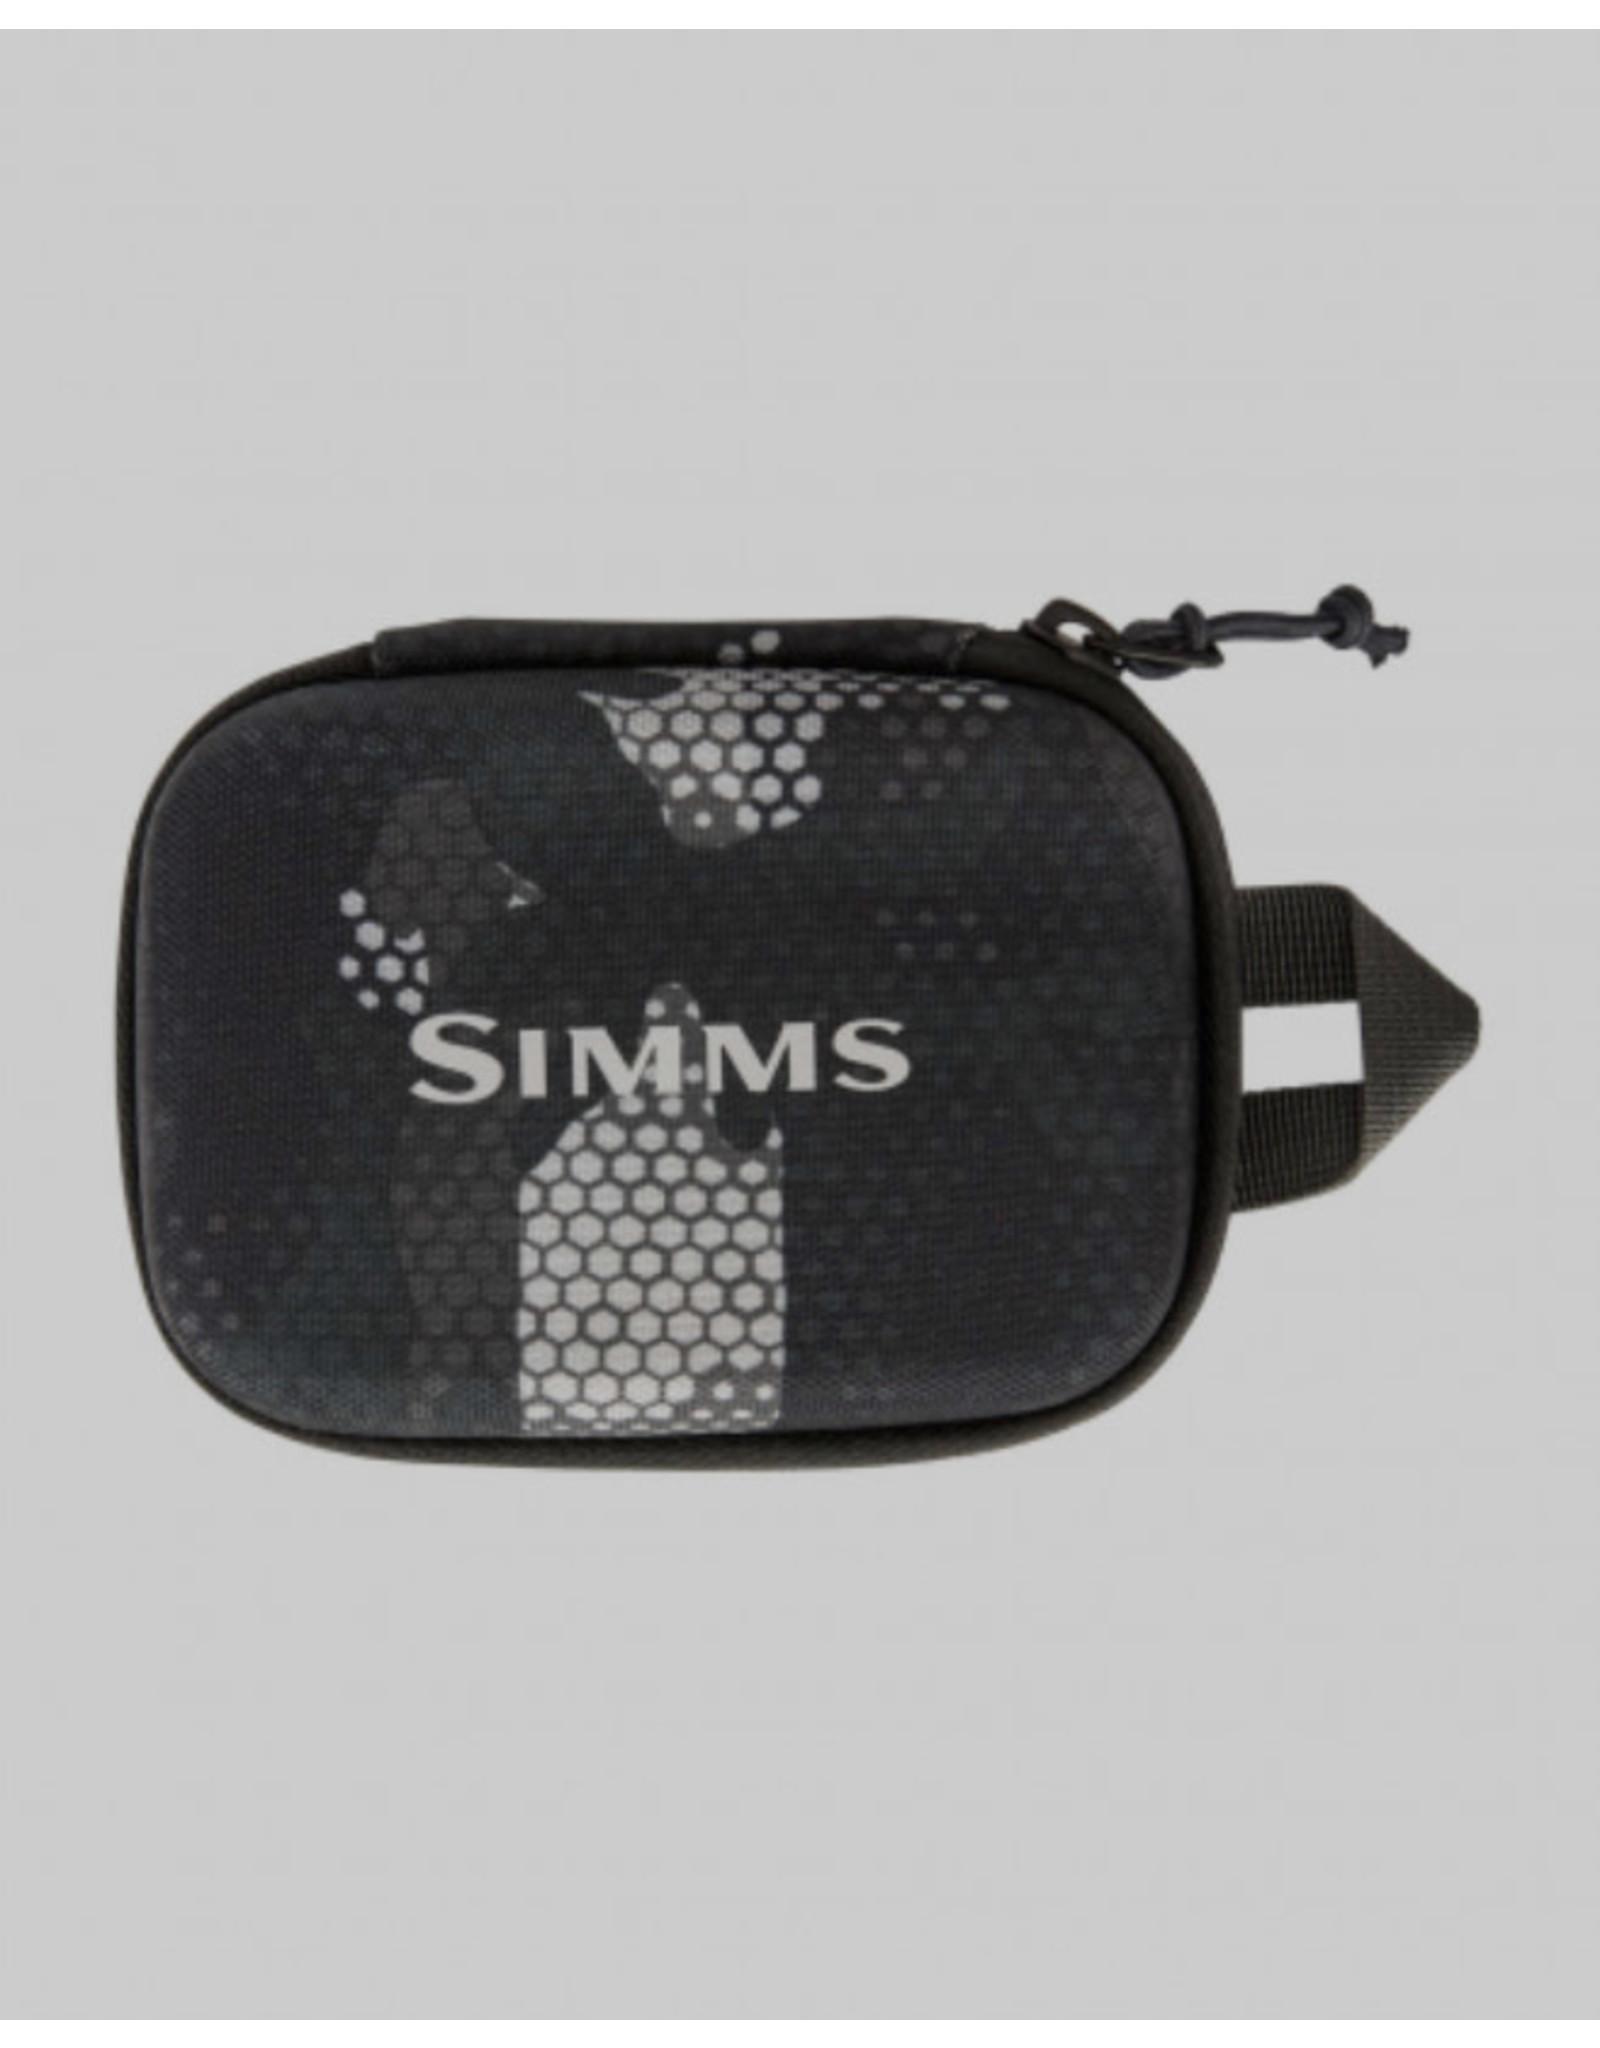 Simms Simms Fish Whistle 2.0 - Hex Flo Camo Carbon